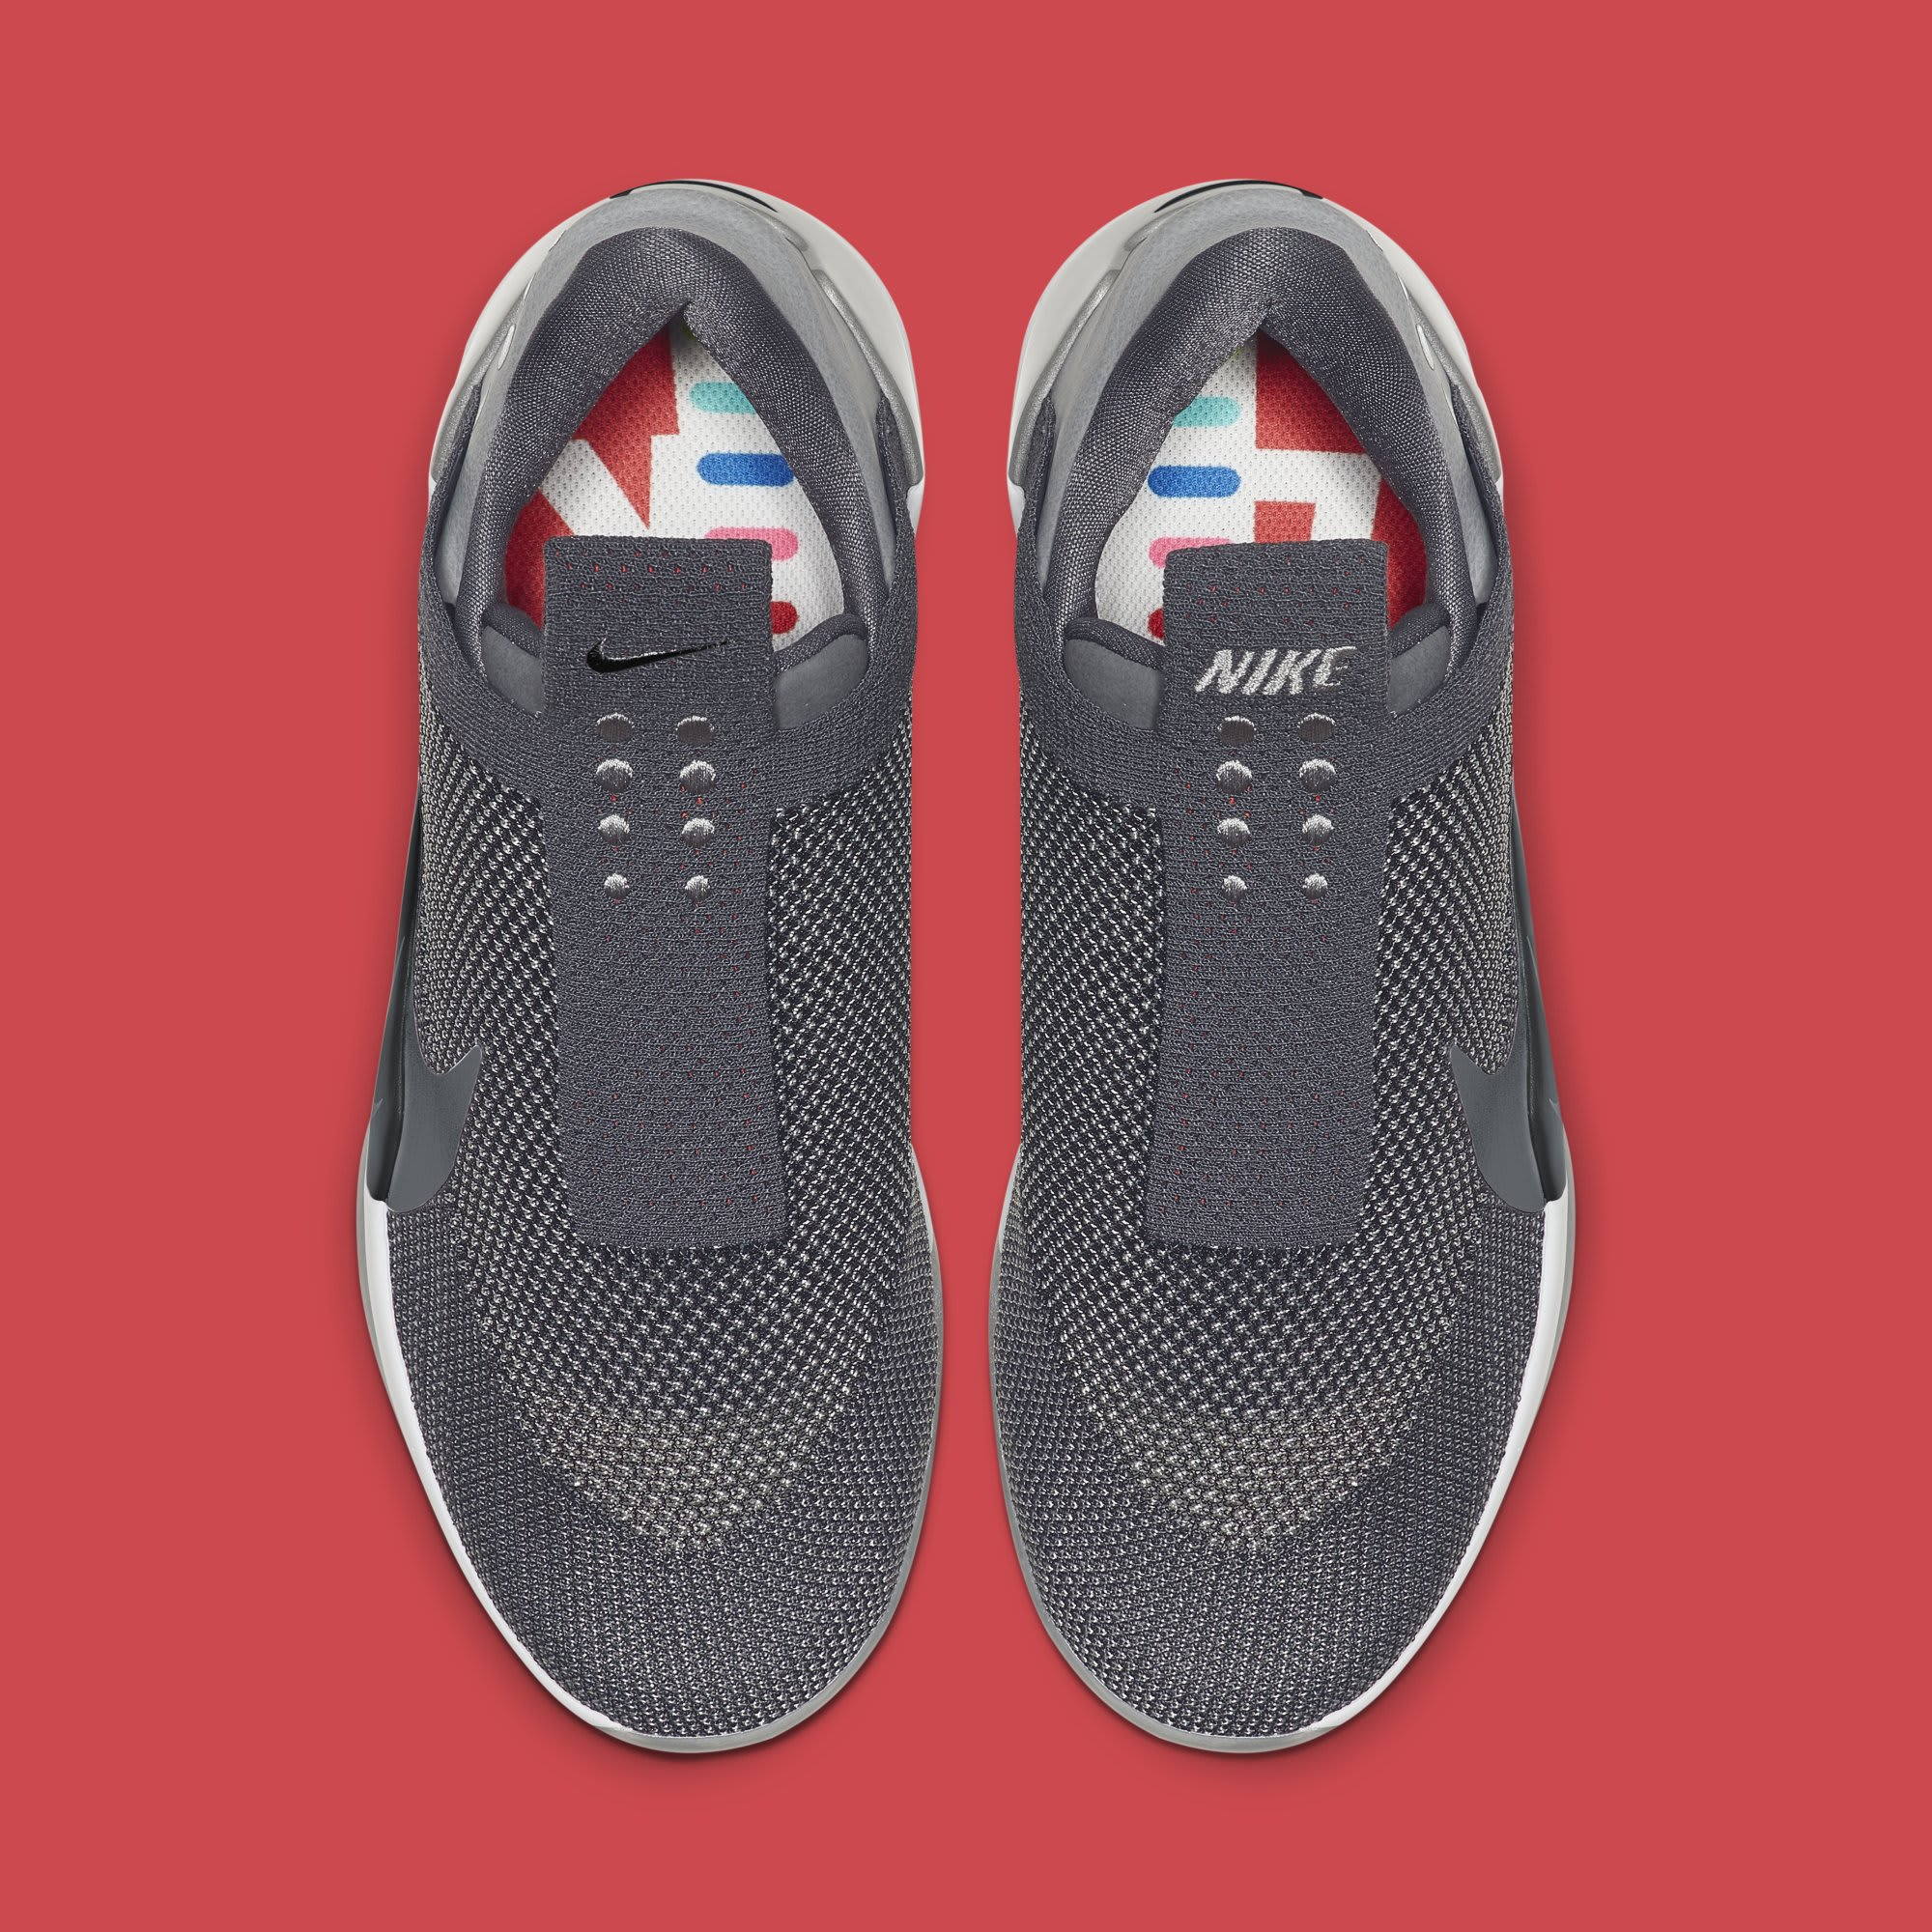 Nike Adapt BB 'Dark Grey' AO2582-004 (Top)